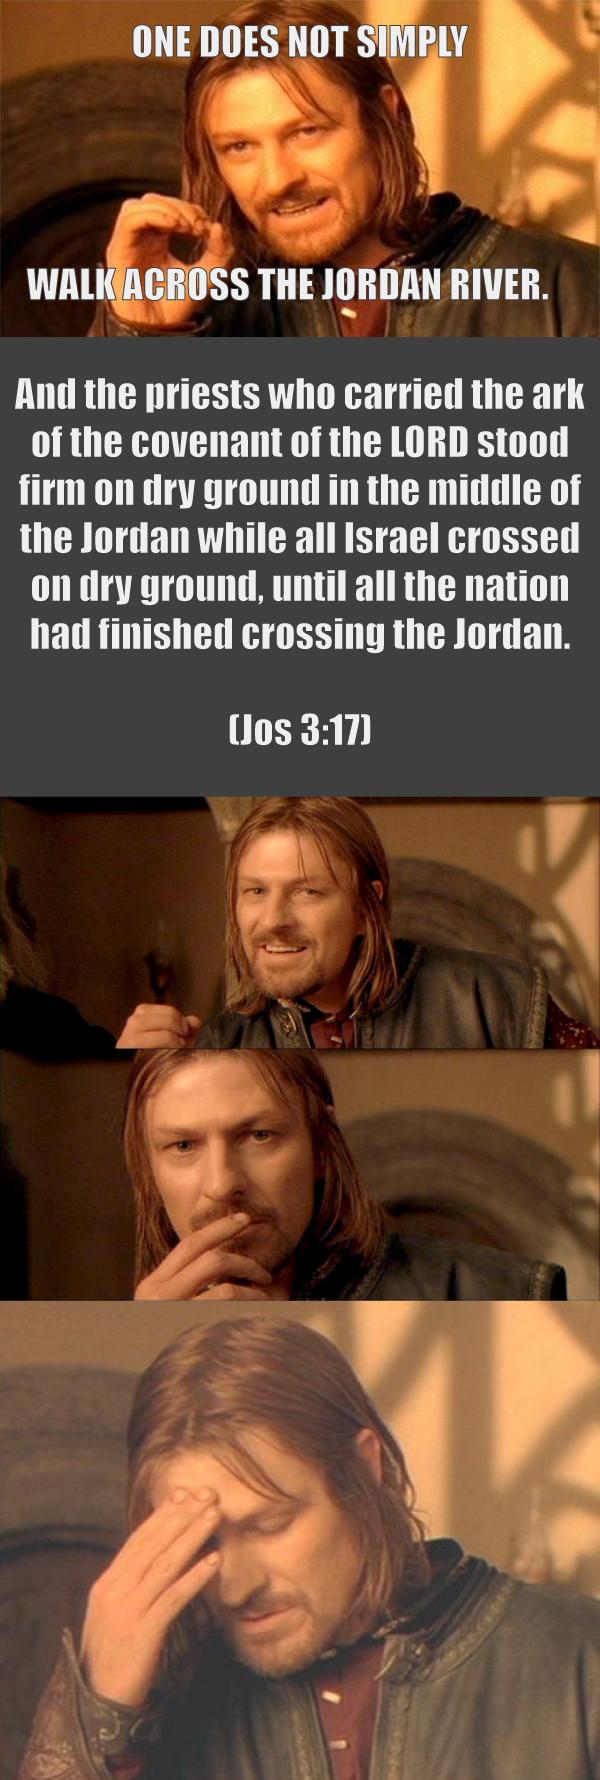 boromir-crossing-jordan